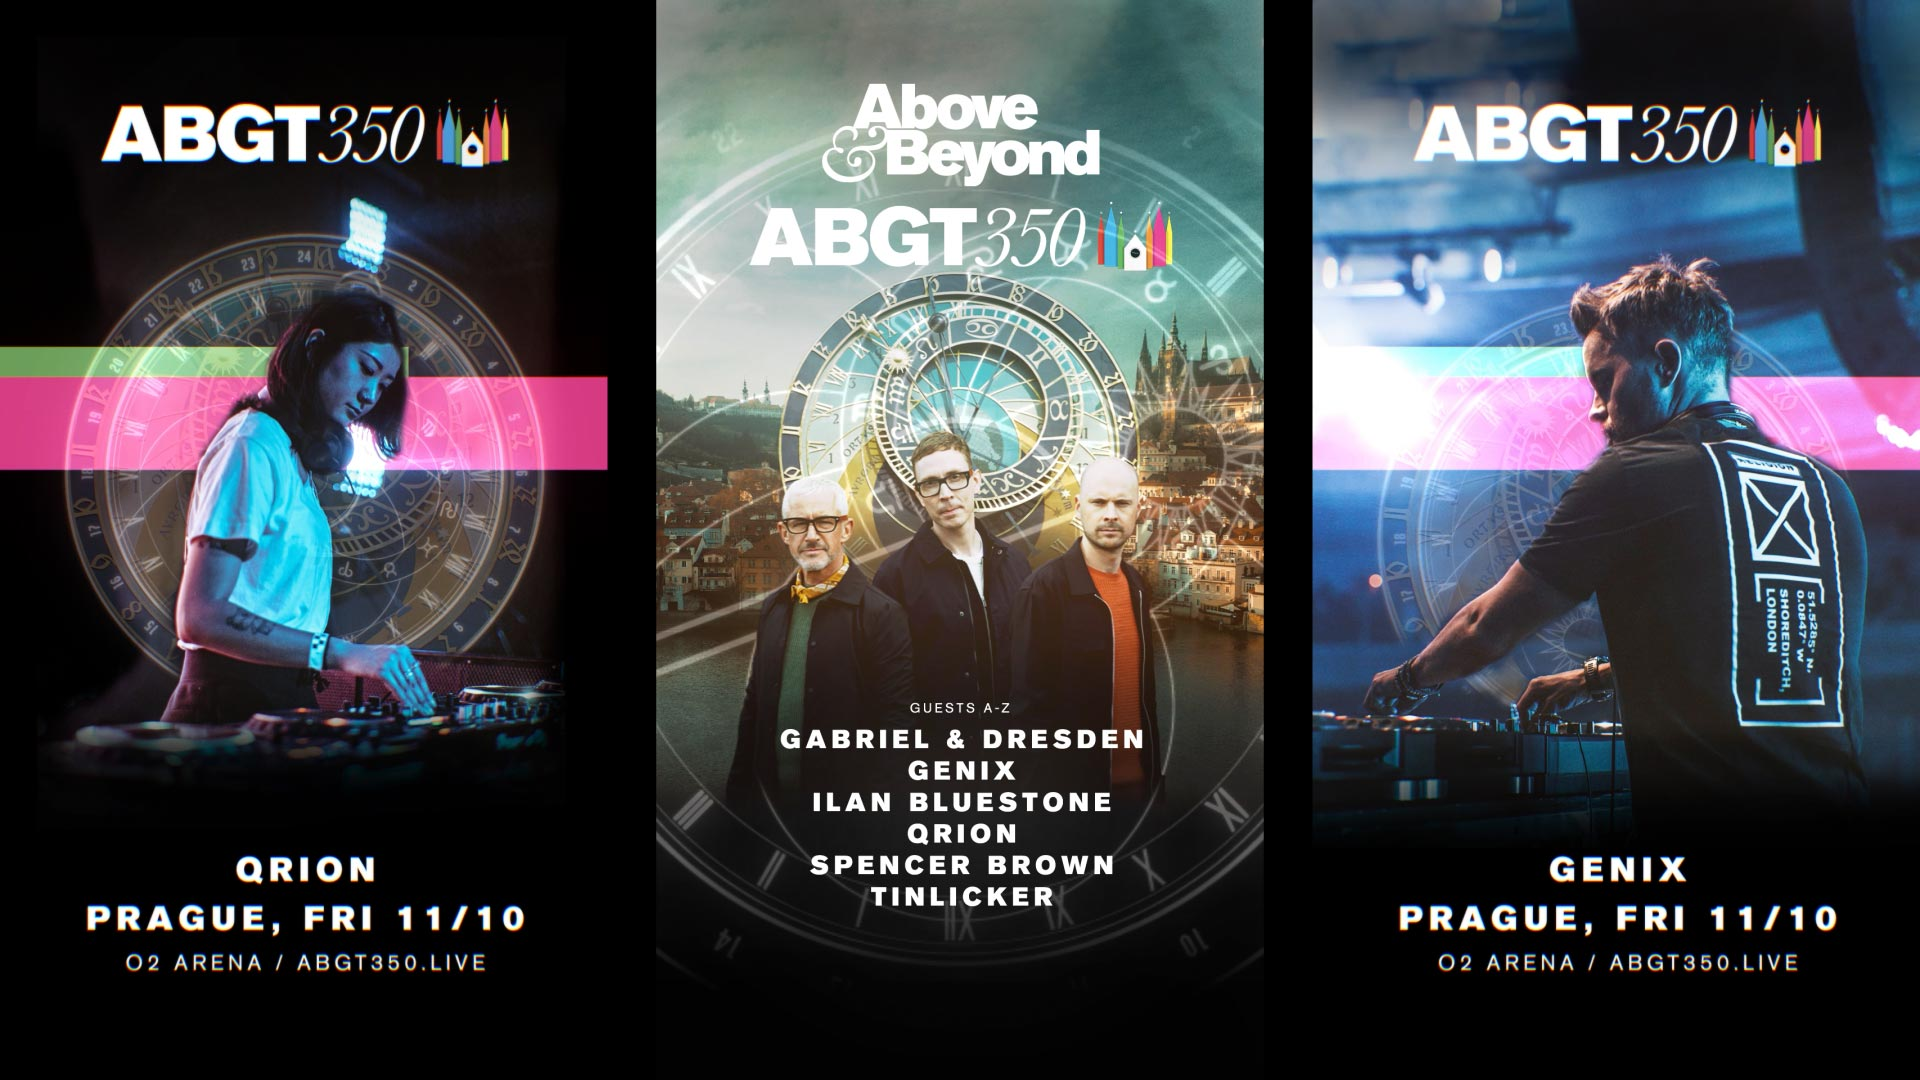 ABGT350 Event Visuals